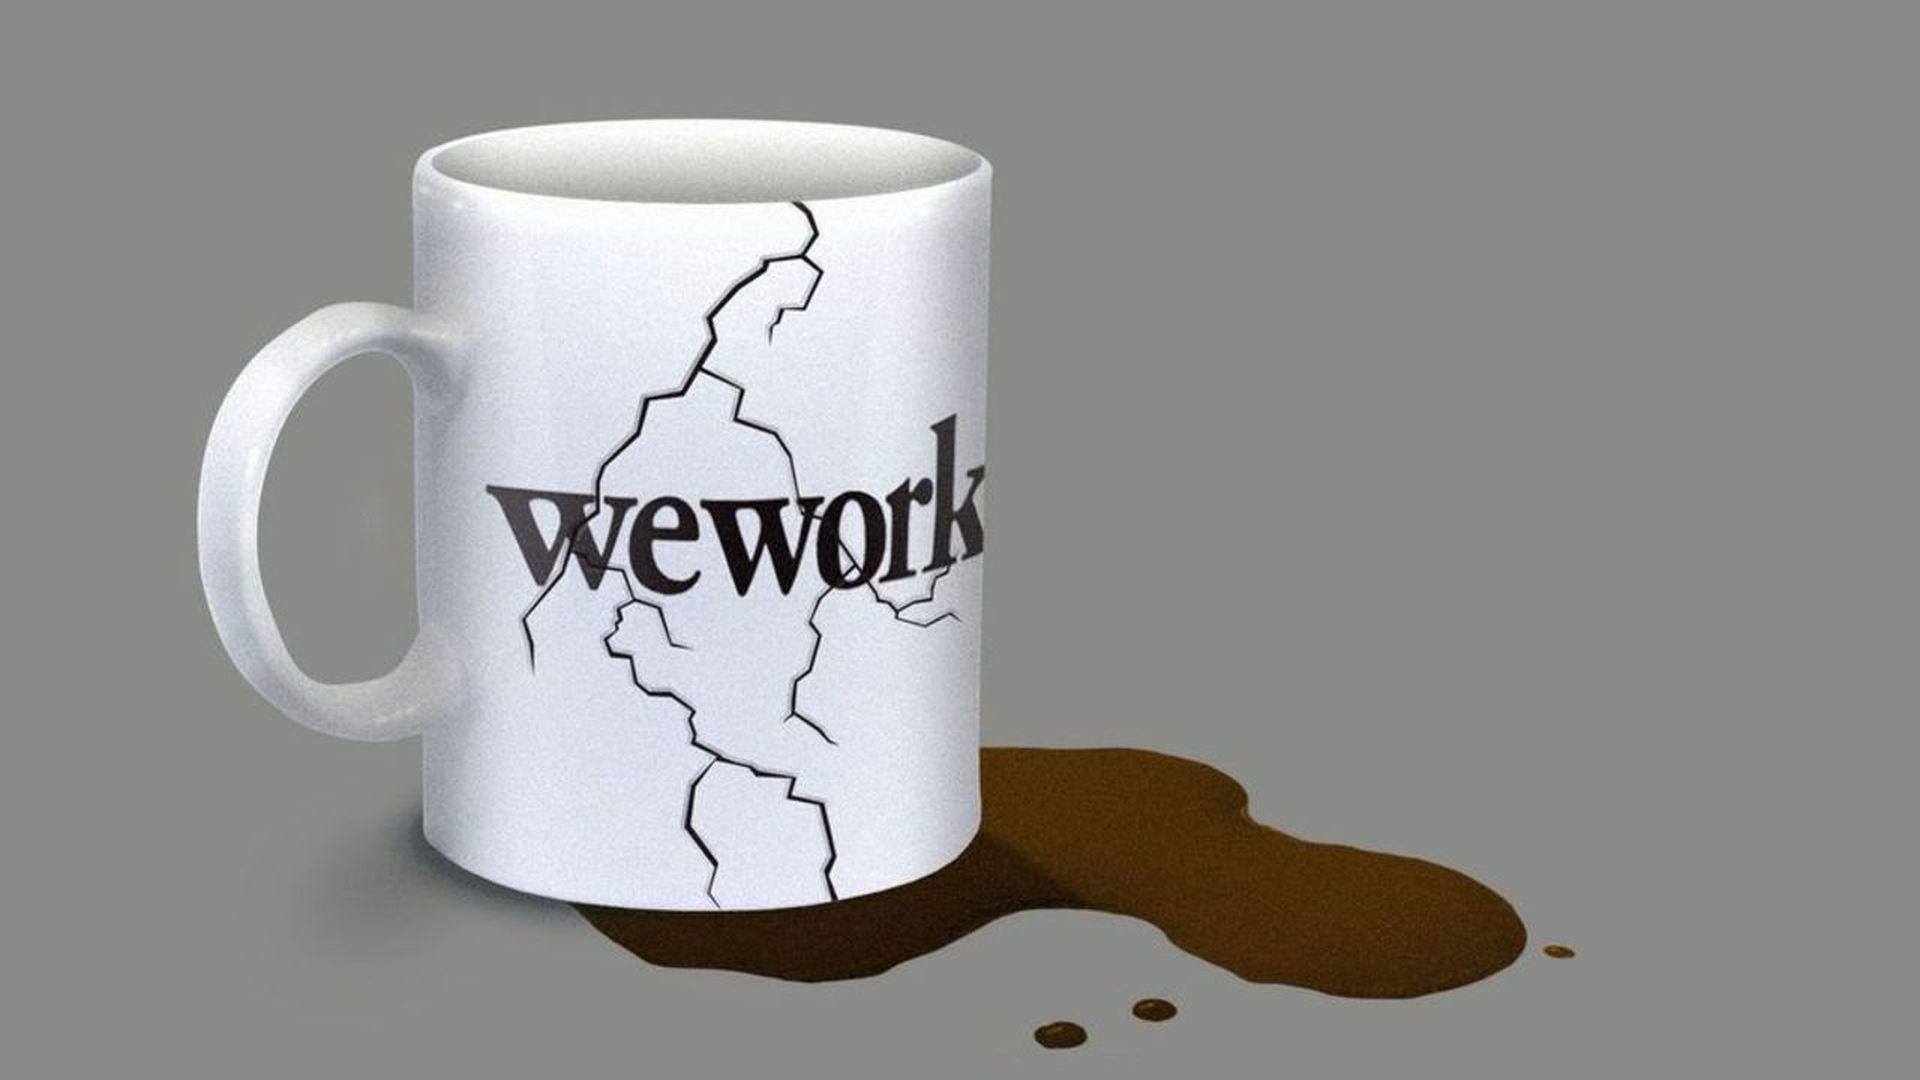 WeWork illustration